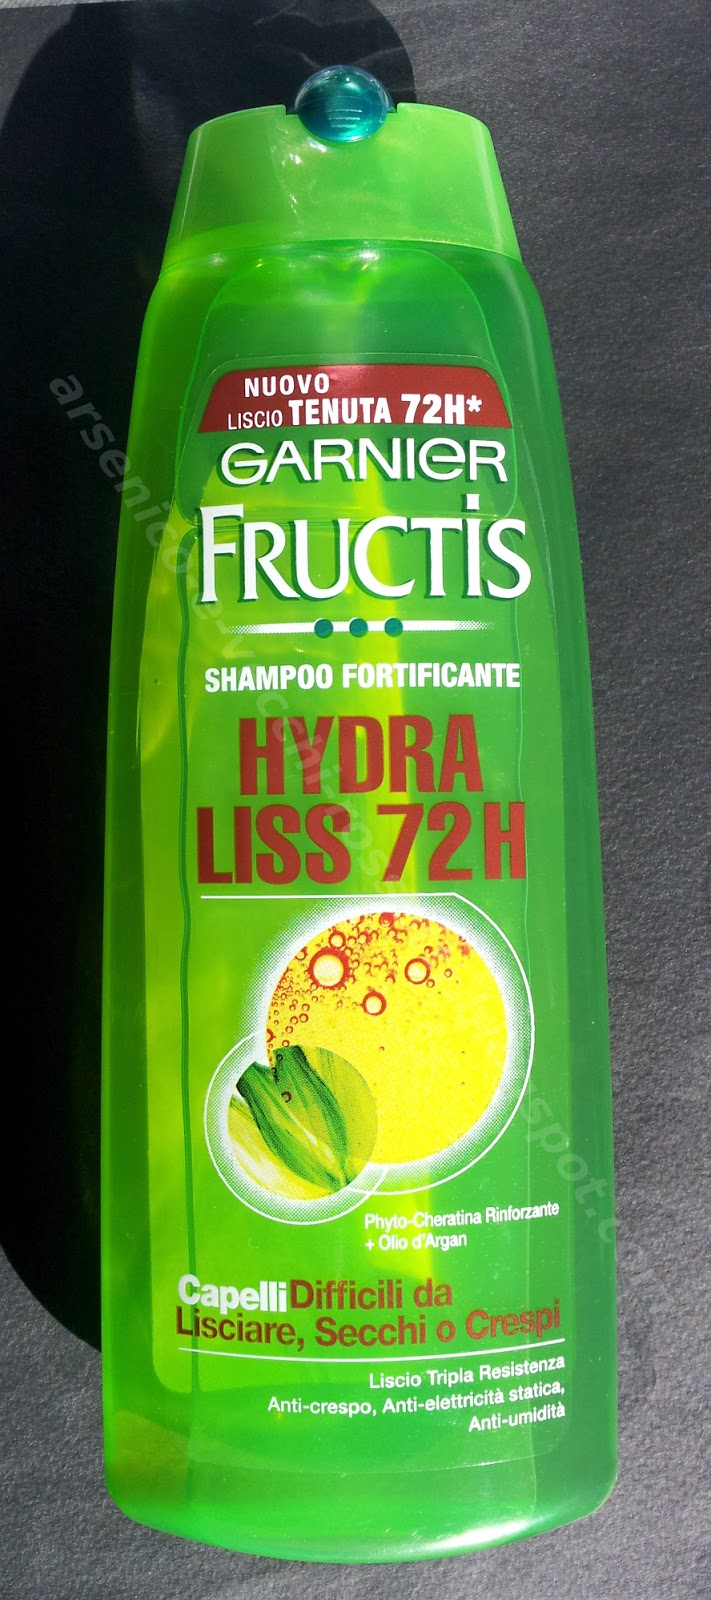 Garnier Fructis Shampoo Hydra Liss 72H per capelli secchi o crespi